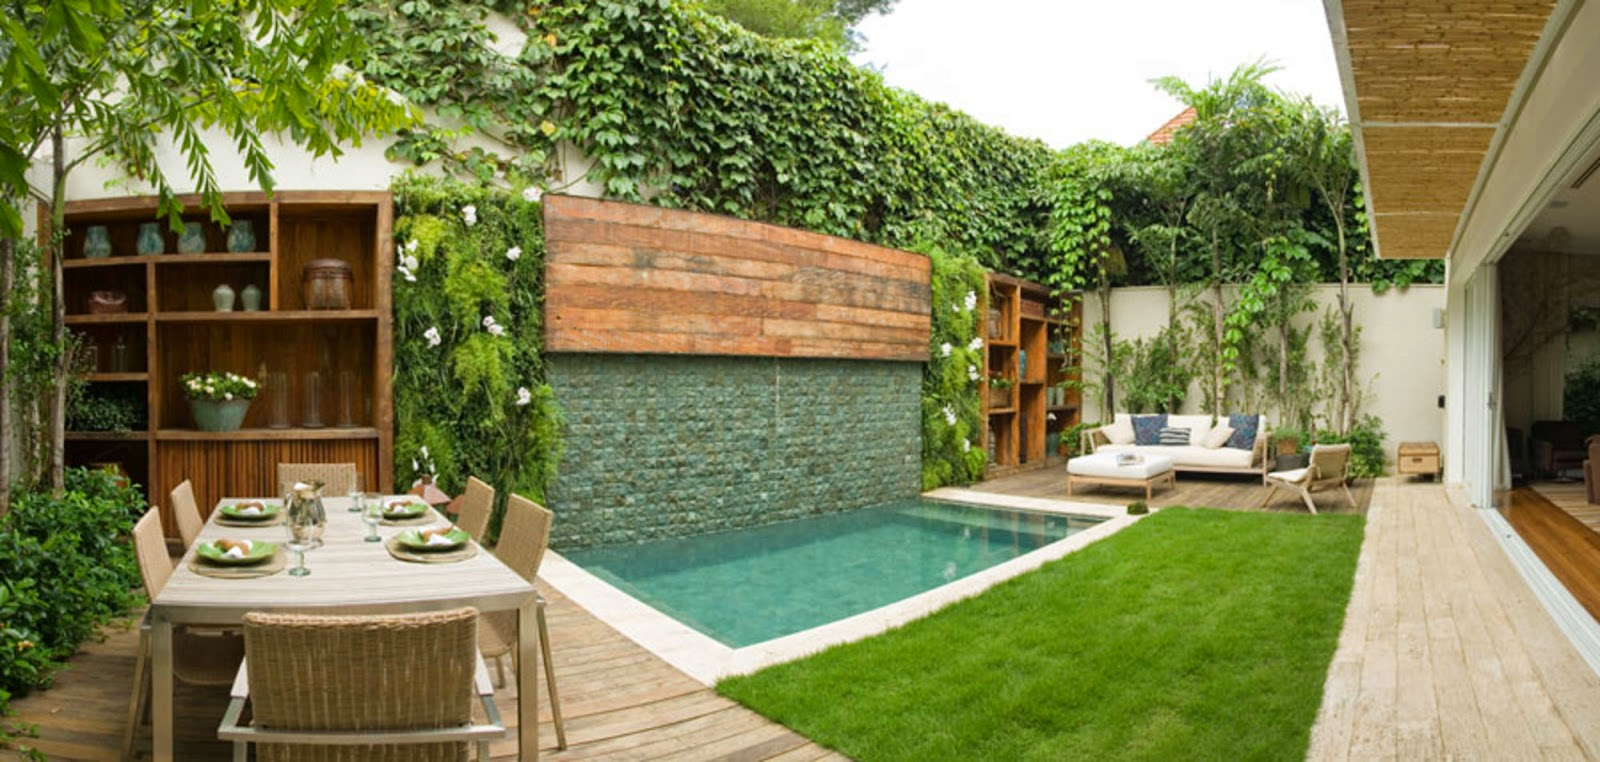 Rea de lazer pequena 60 projetos modelos e fotos Fotos de patios de casas pequenas